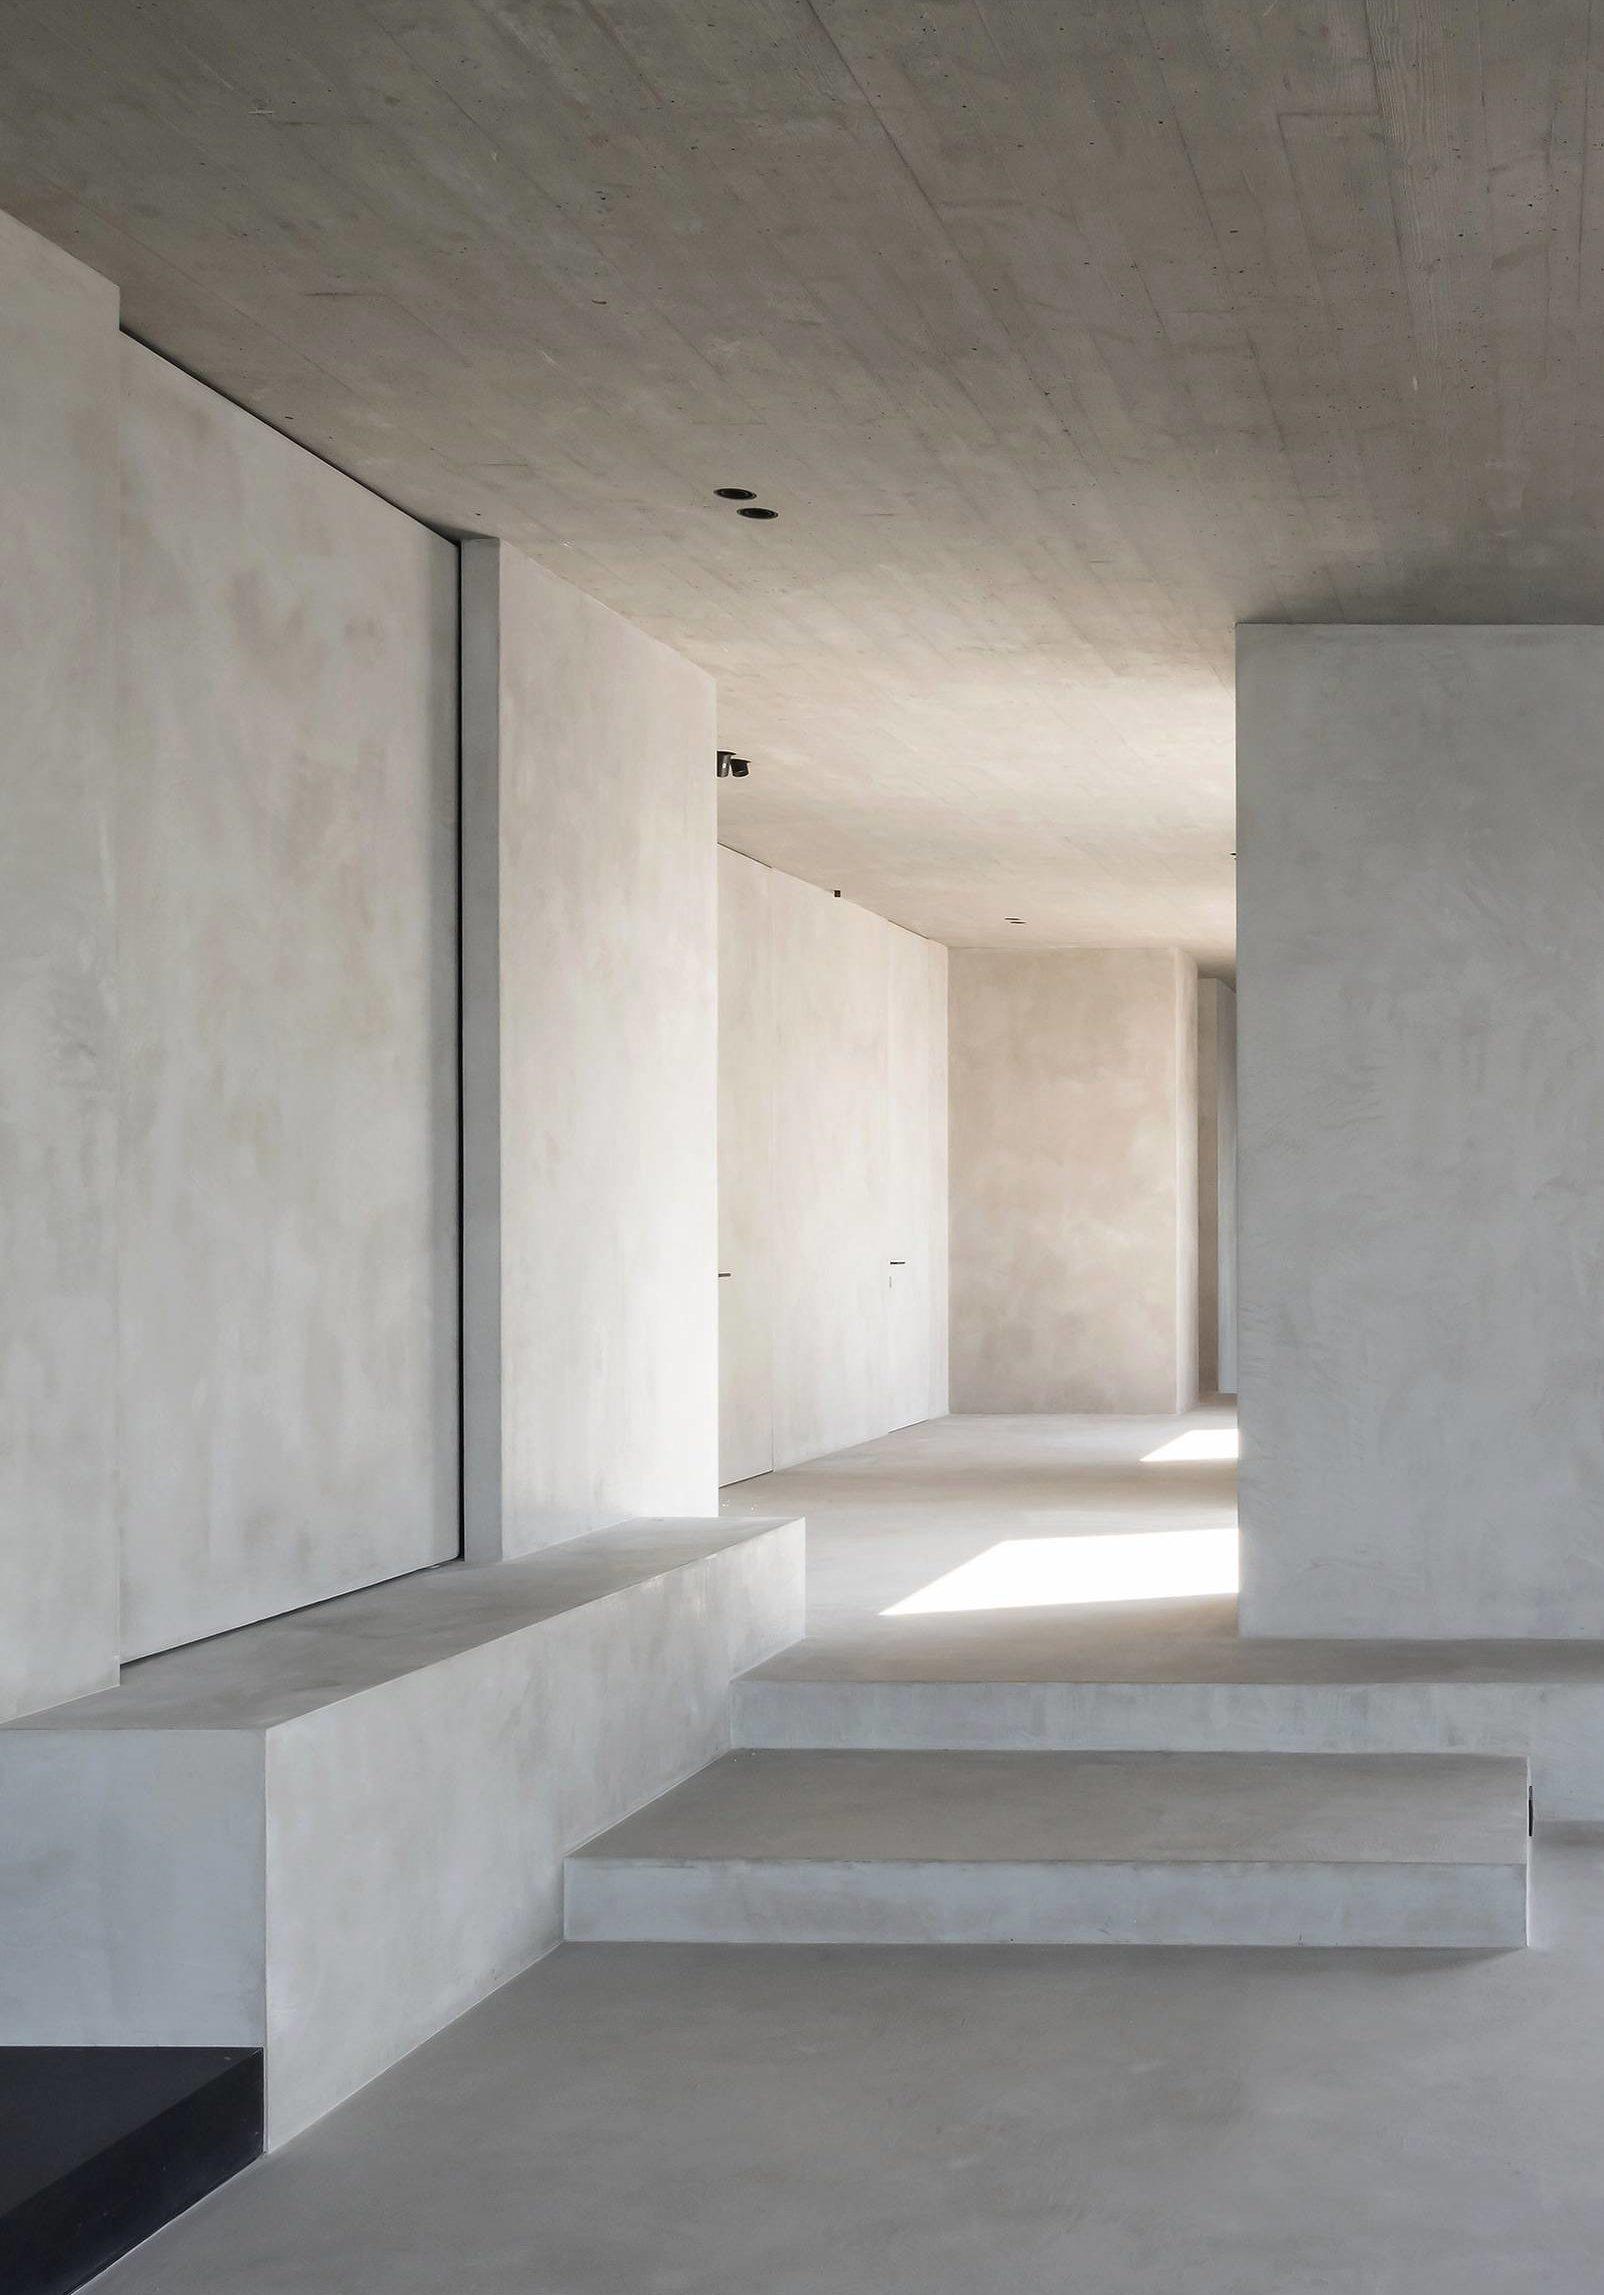 El C Penthouse de Van Duysen ofrece una singular panorámica de Amberes